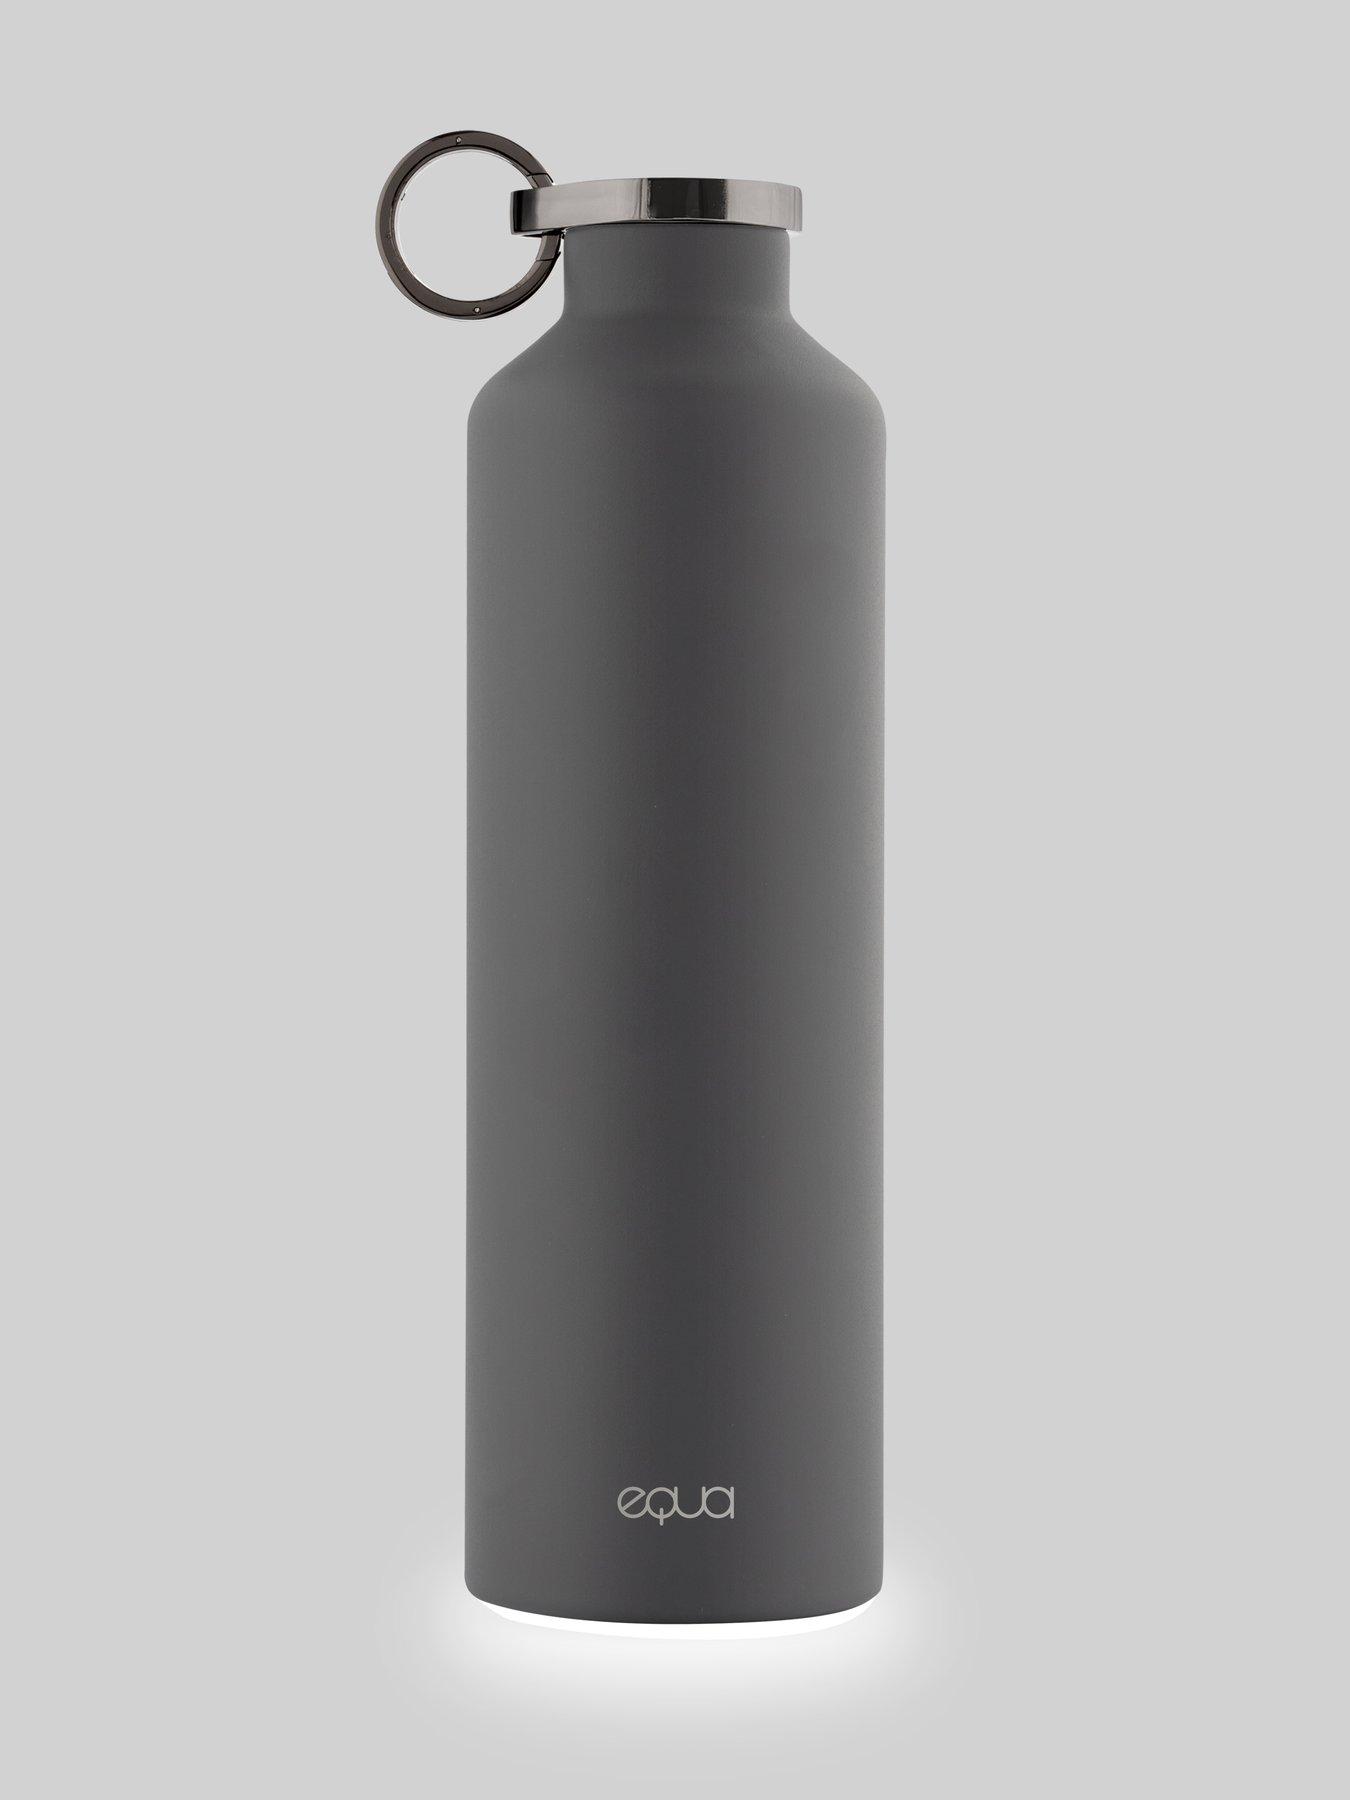 Sticla pentru apa Equa Smart Gri inchis- 680 ml imagine